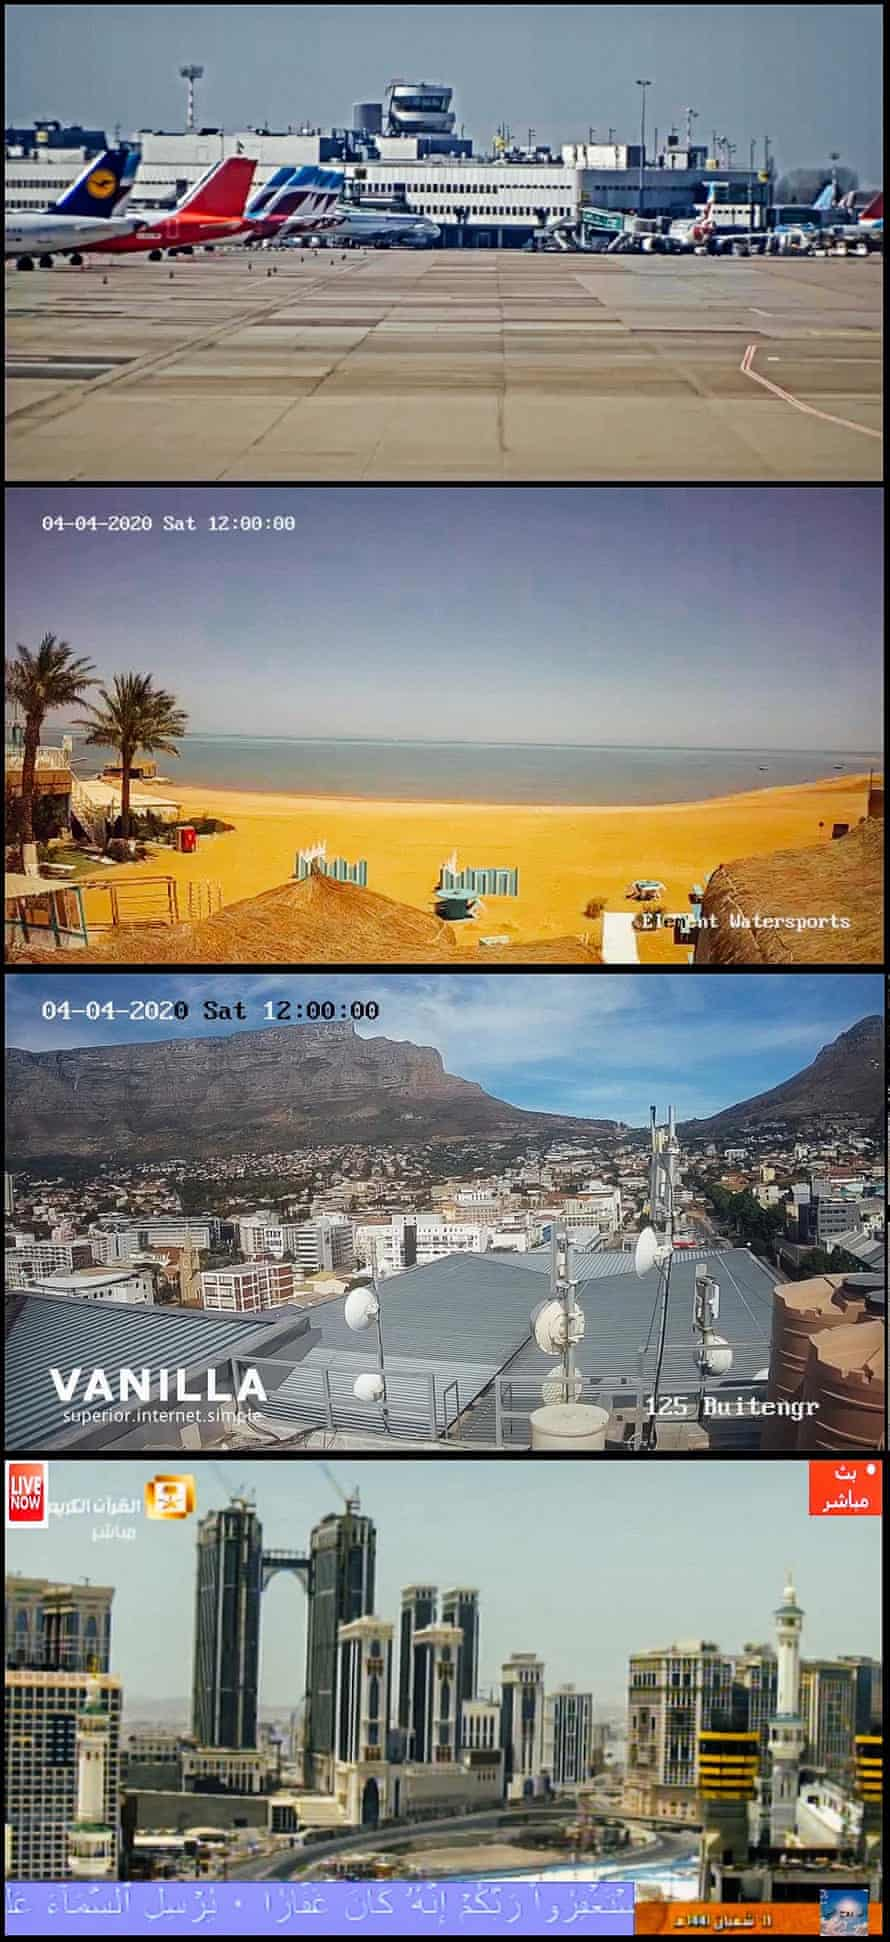 Dusseldorf airport, Germany; El-Gouna, Red Sea coast, Egypt; Cape Town, South Africa; Mecca, Saudi Arabia